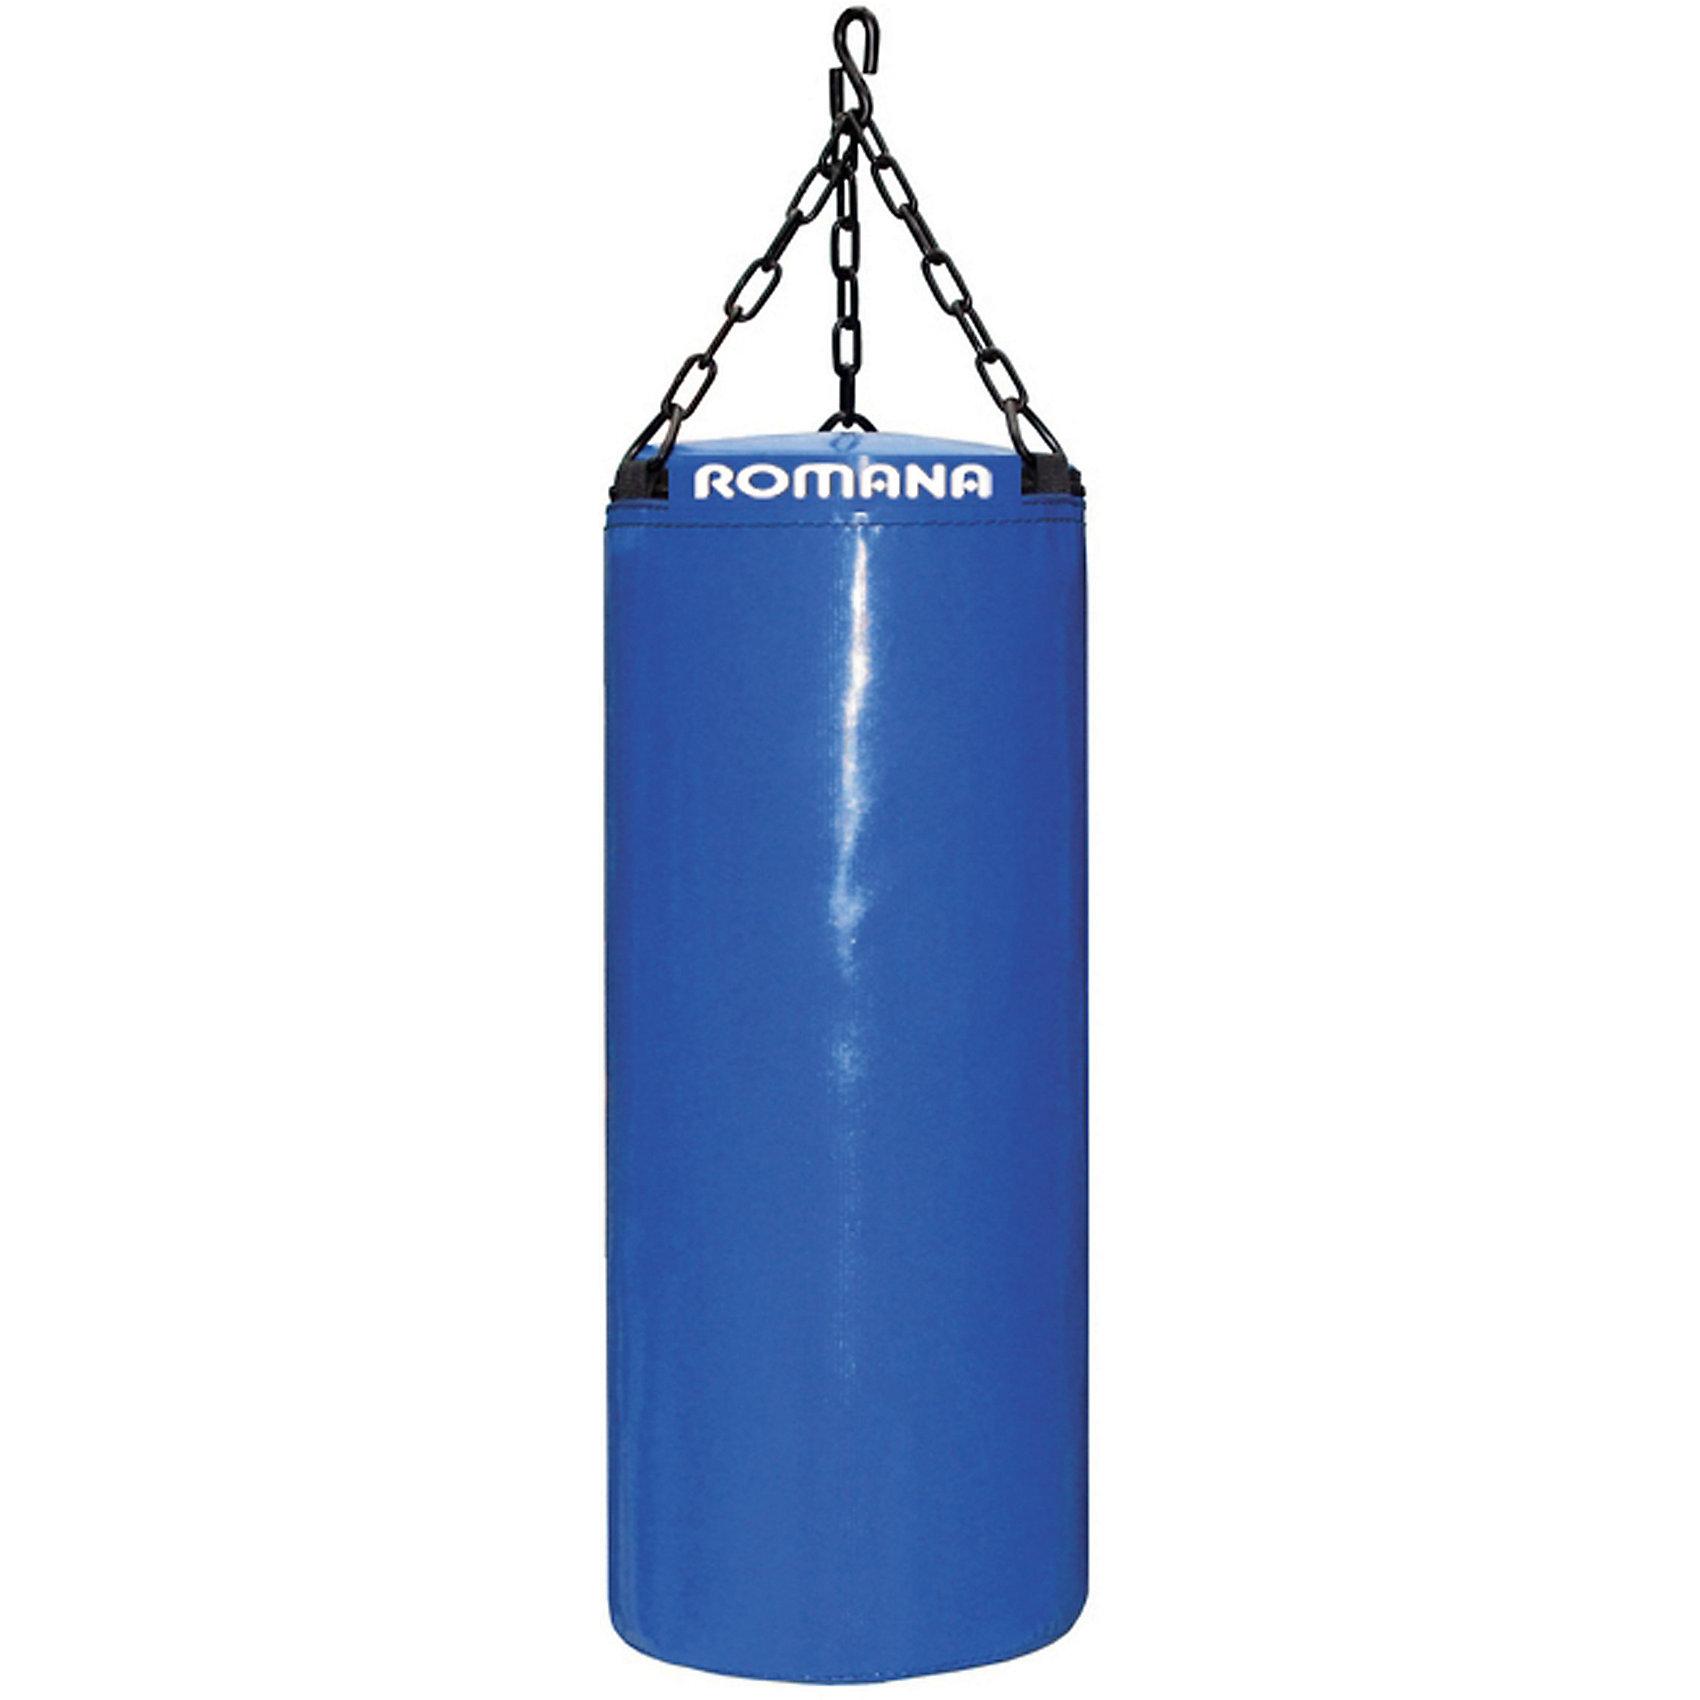 Мешок боксерский, вес 5кг, ROMANA от myToys